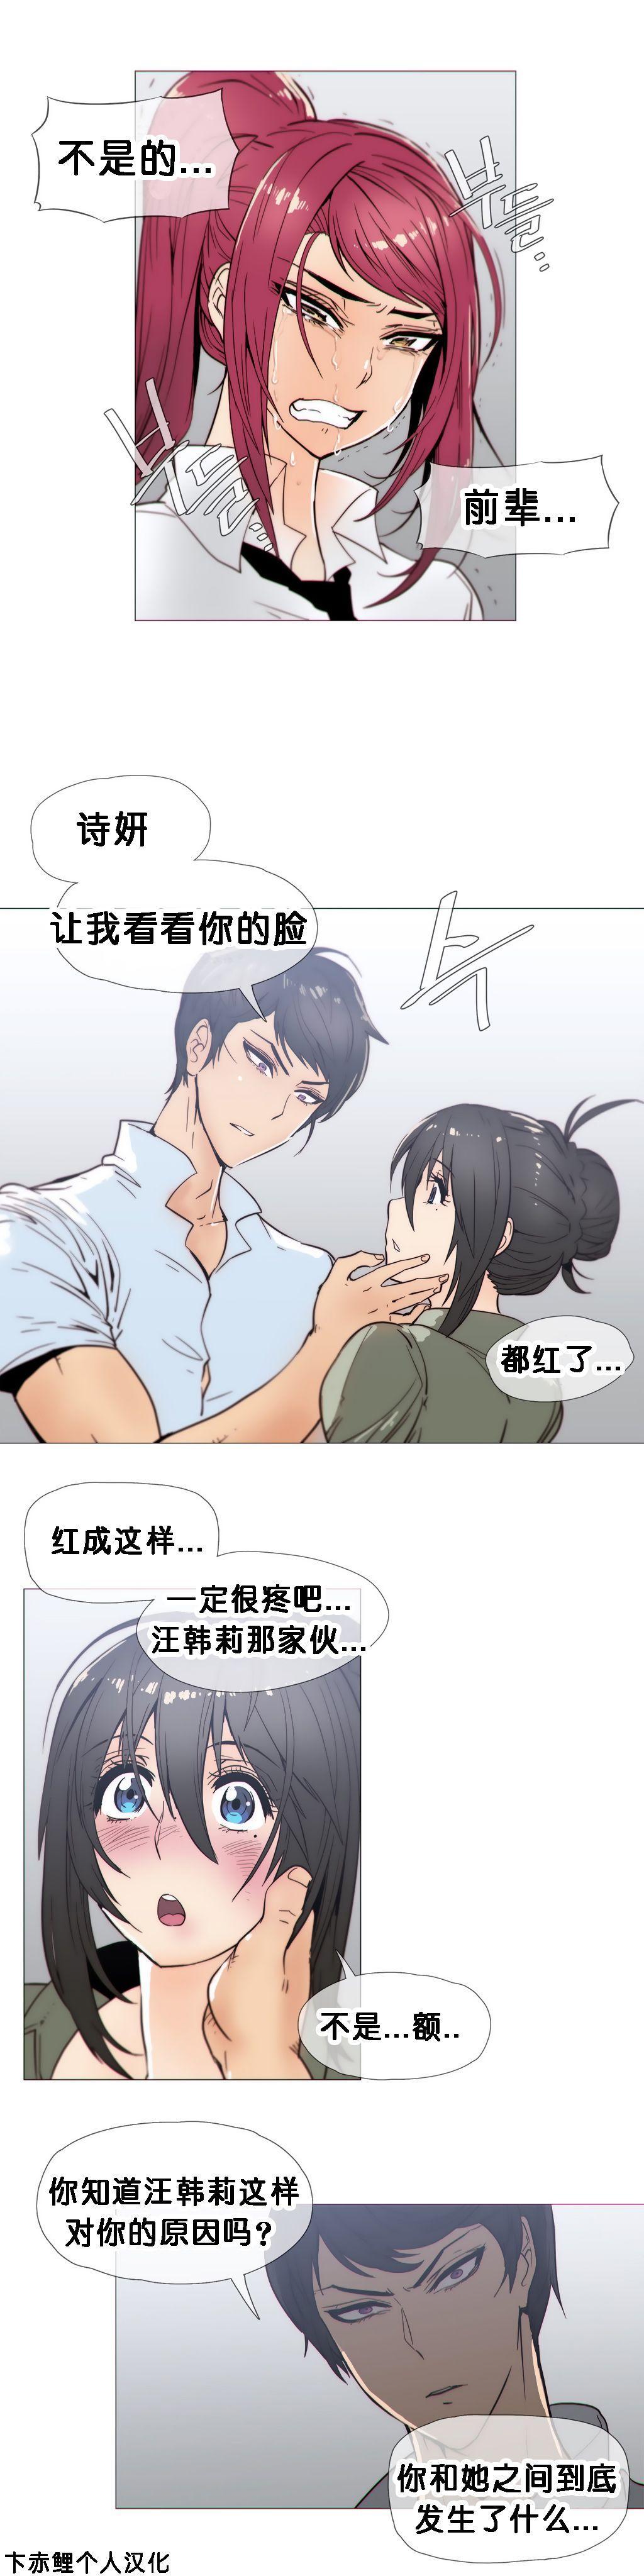 HouseHold Affairs 【卞赤鲤个人汉化】1~33话(持续更新中) 505